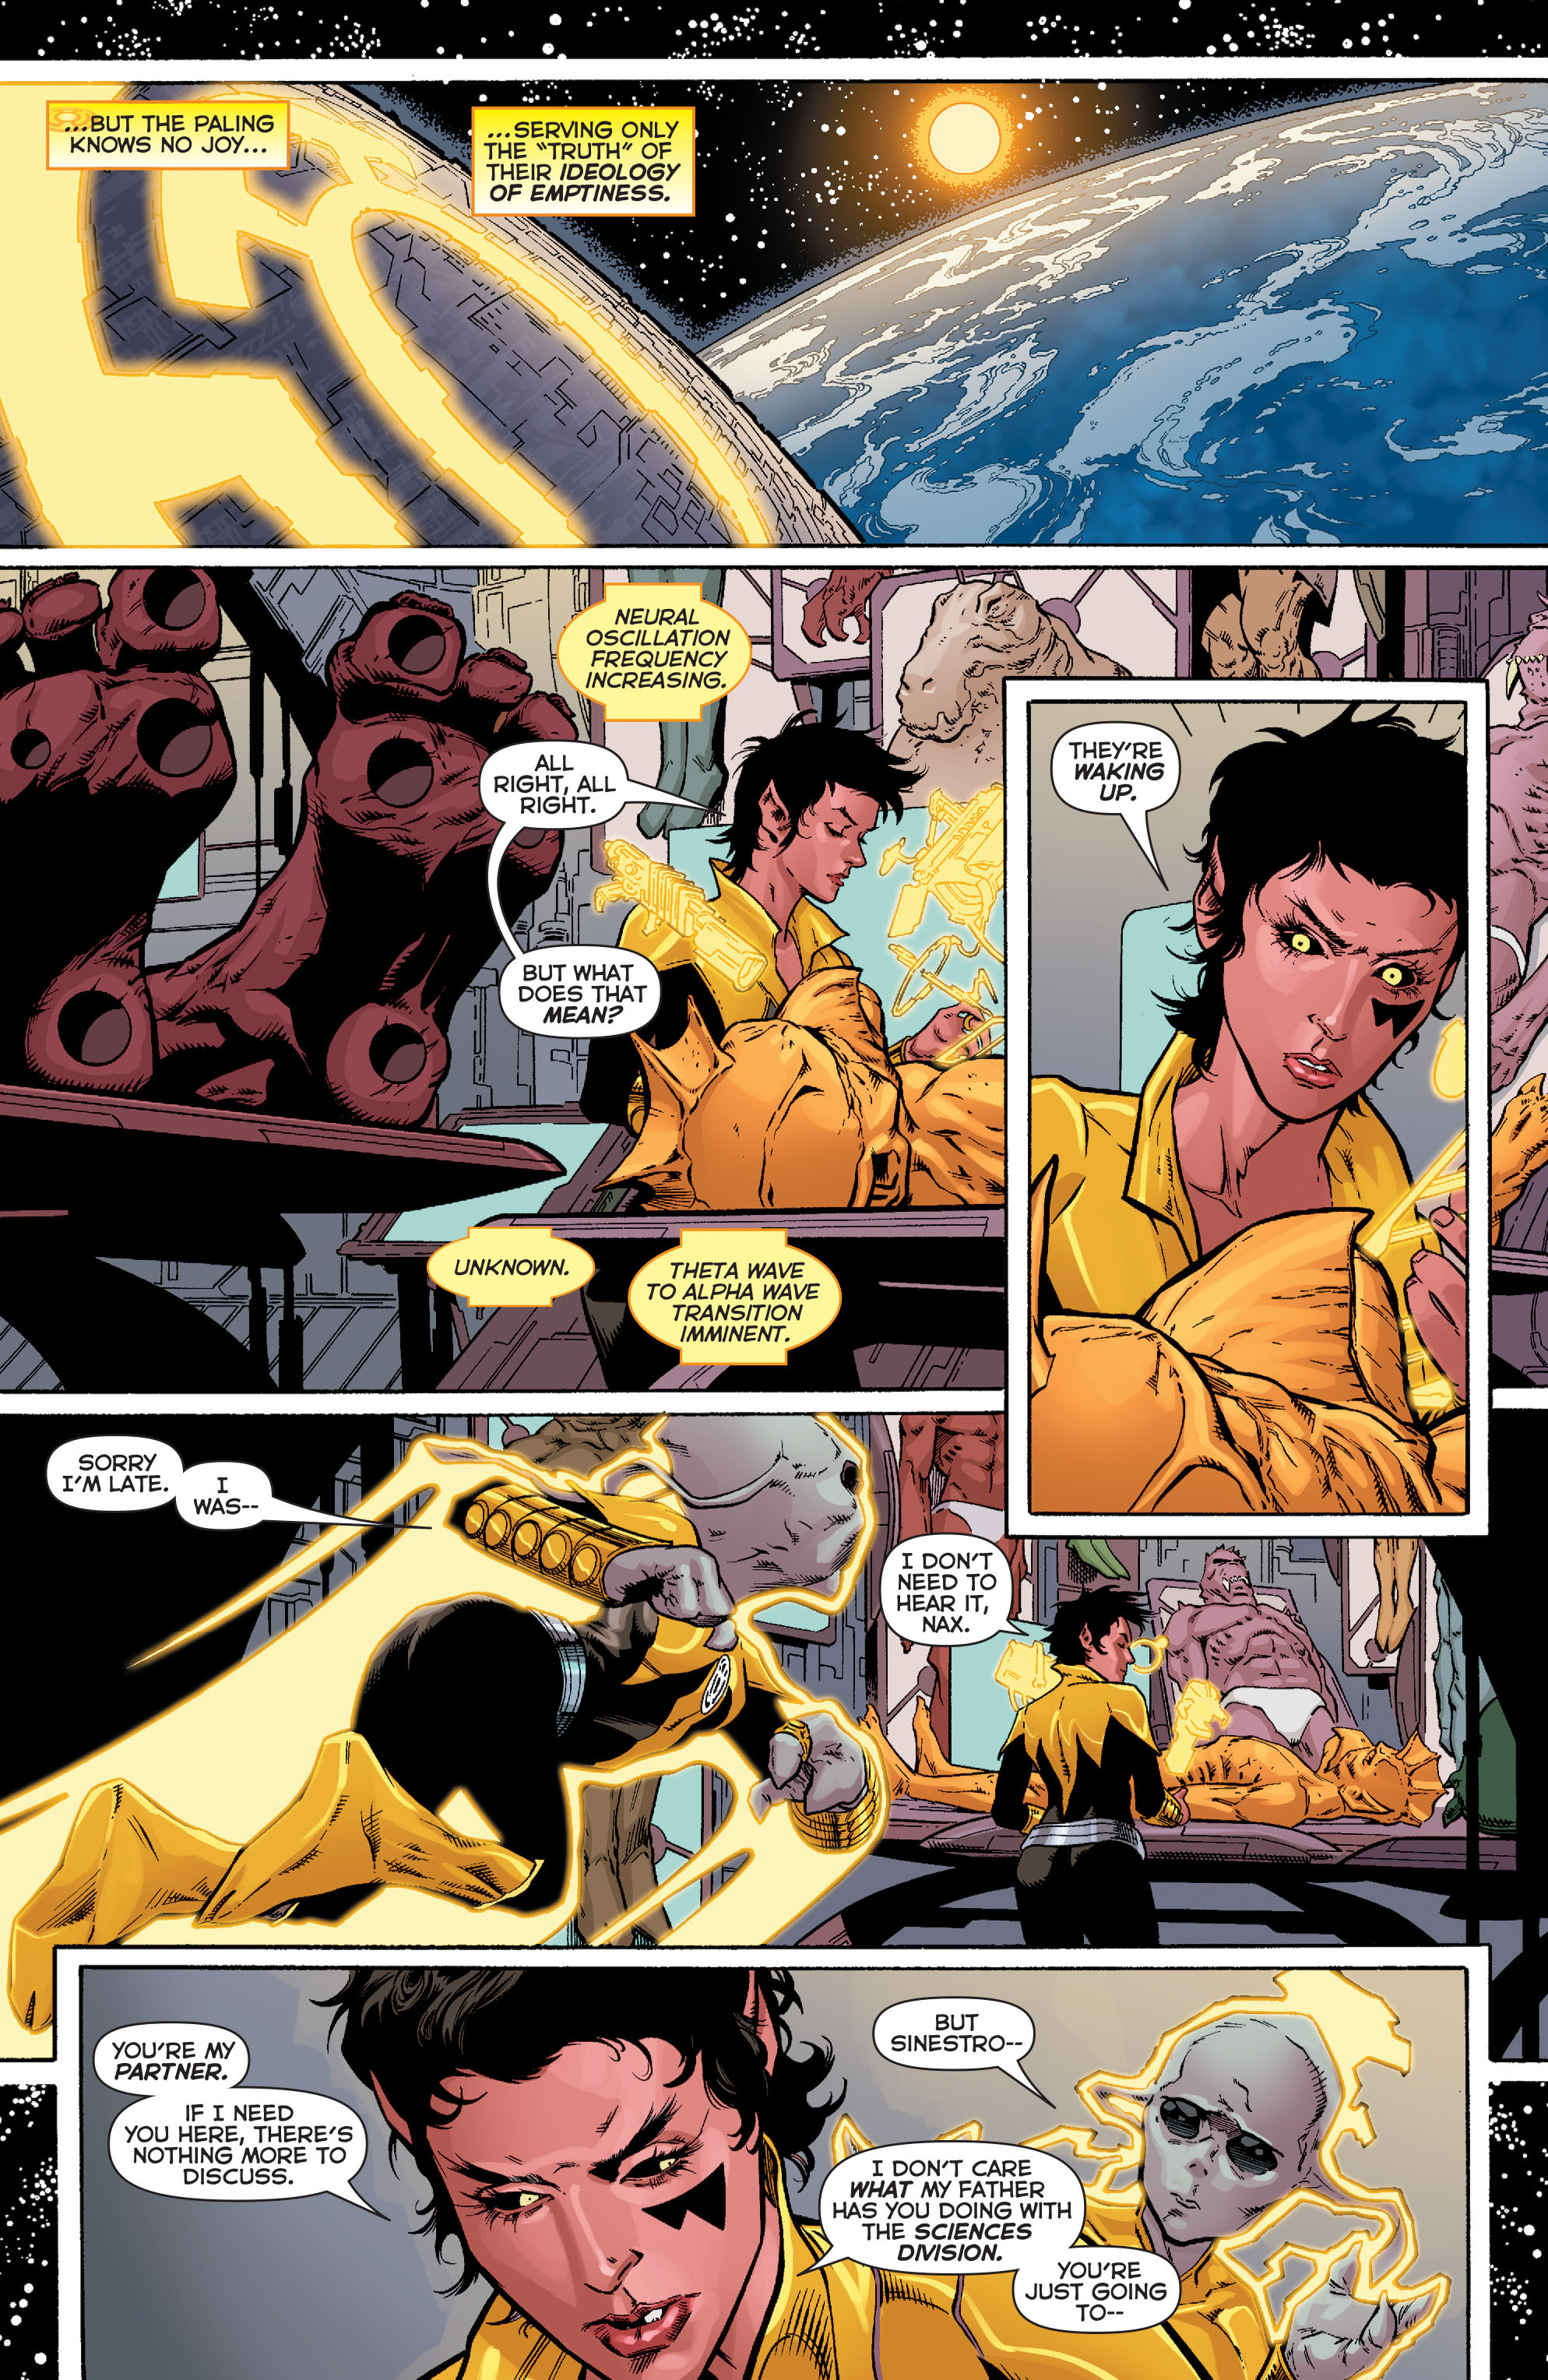 Read online Sinestro comic -  Issue #17 - 11